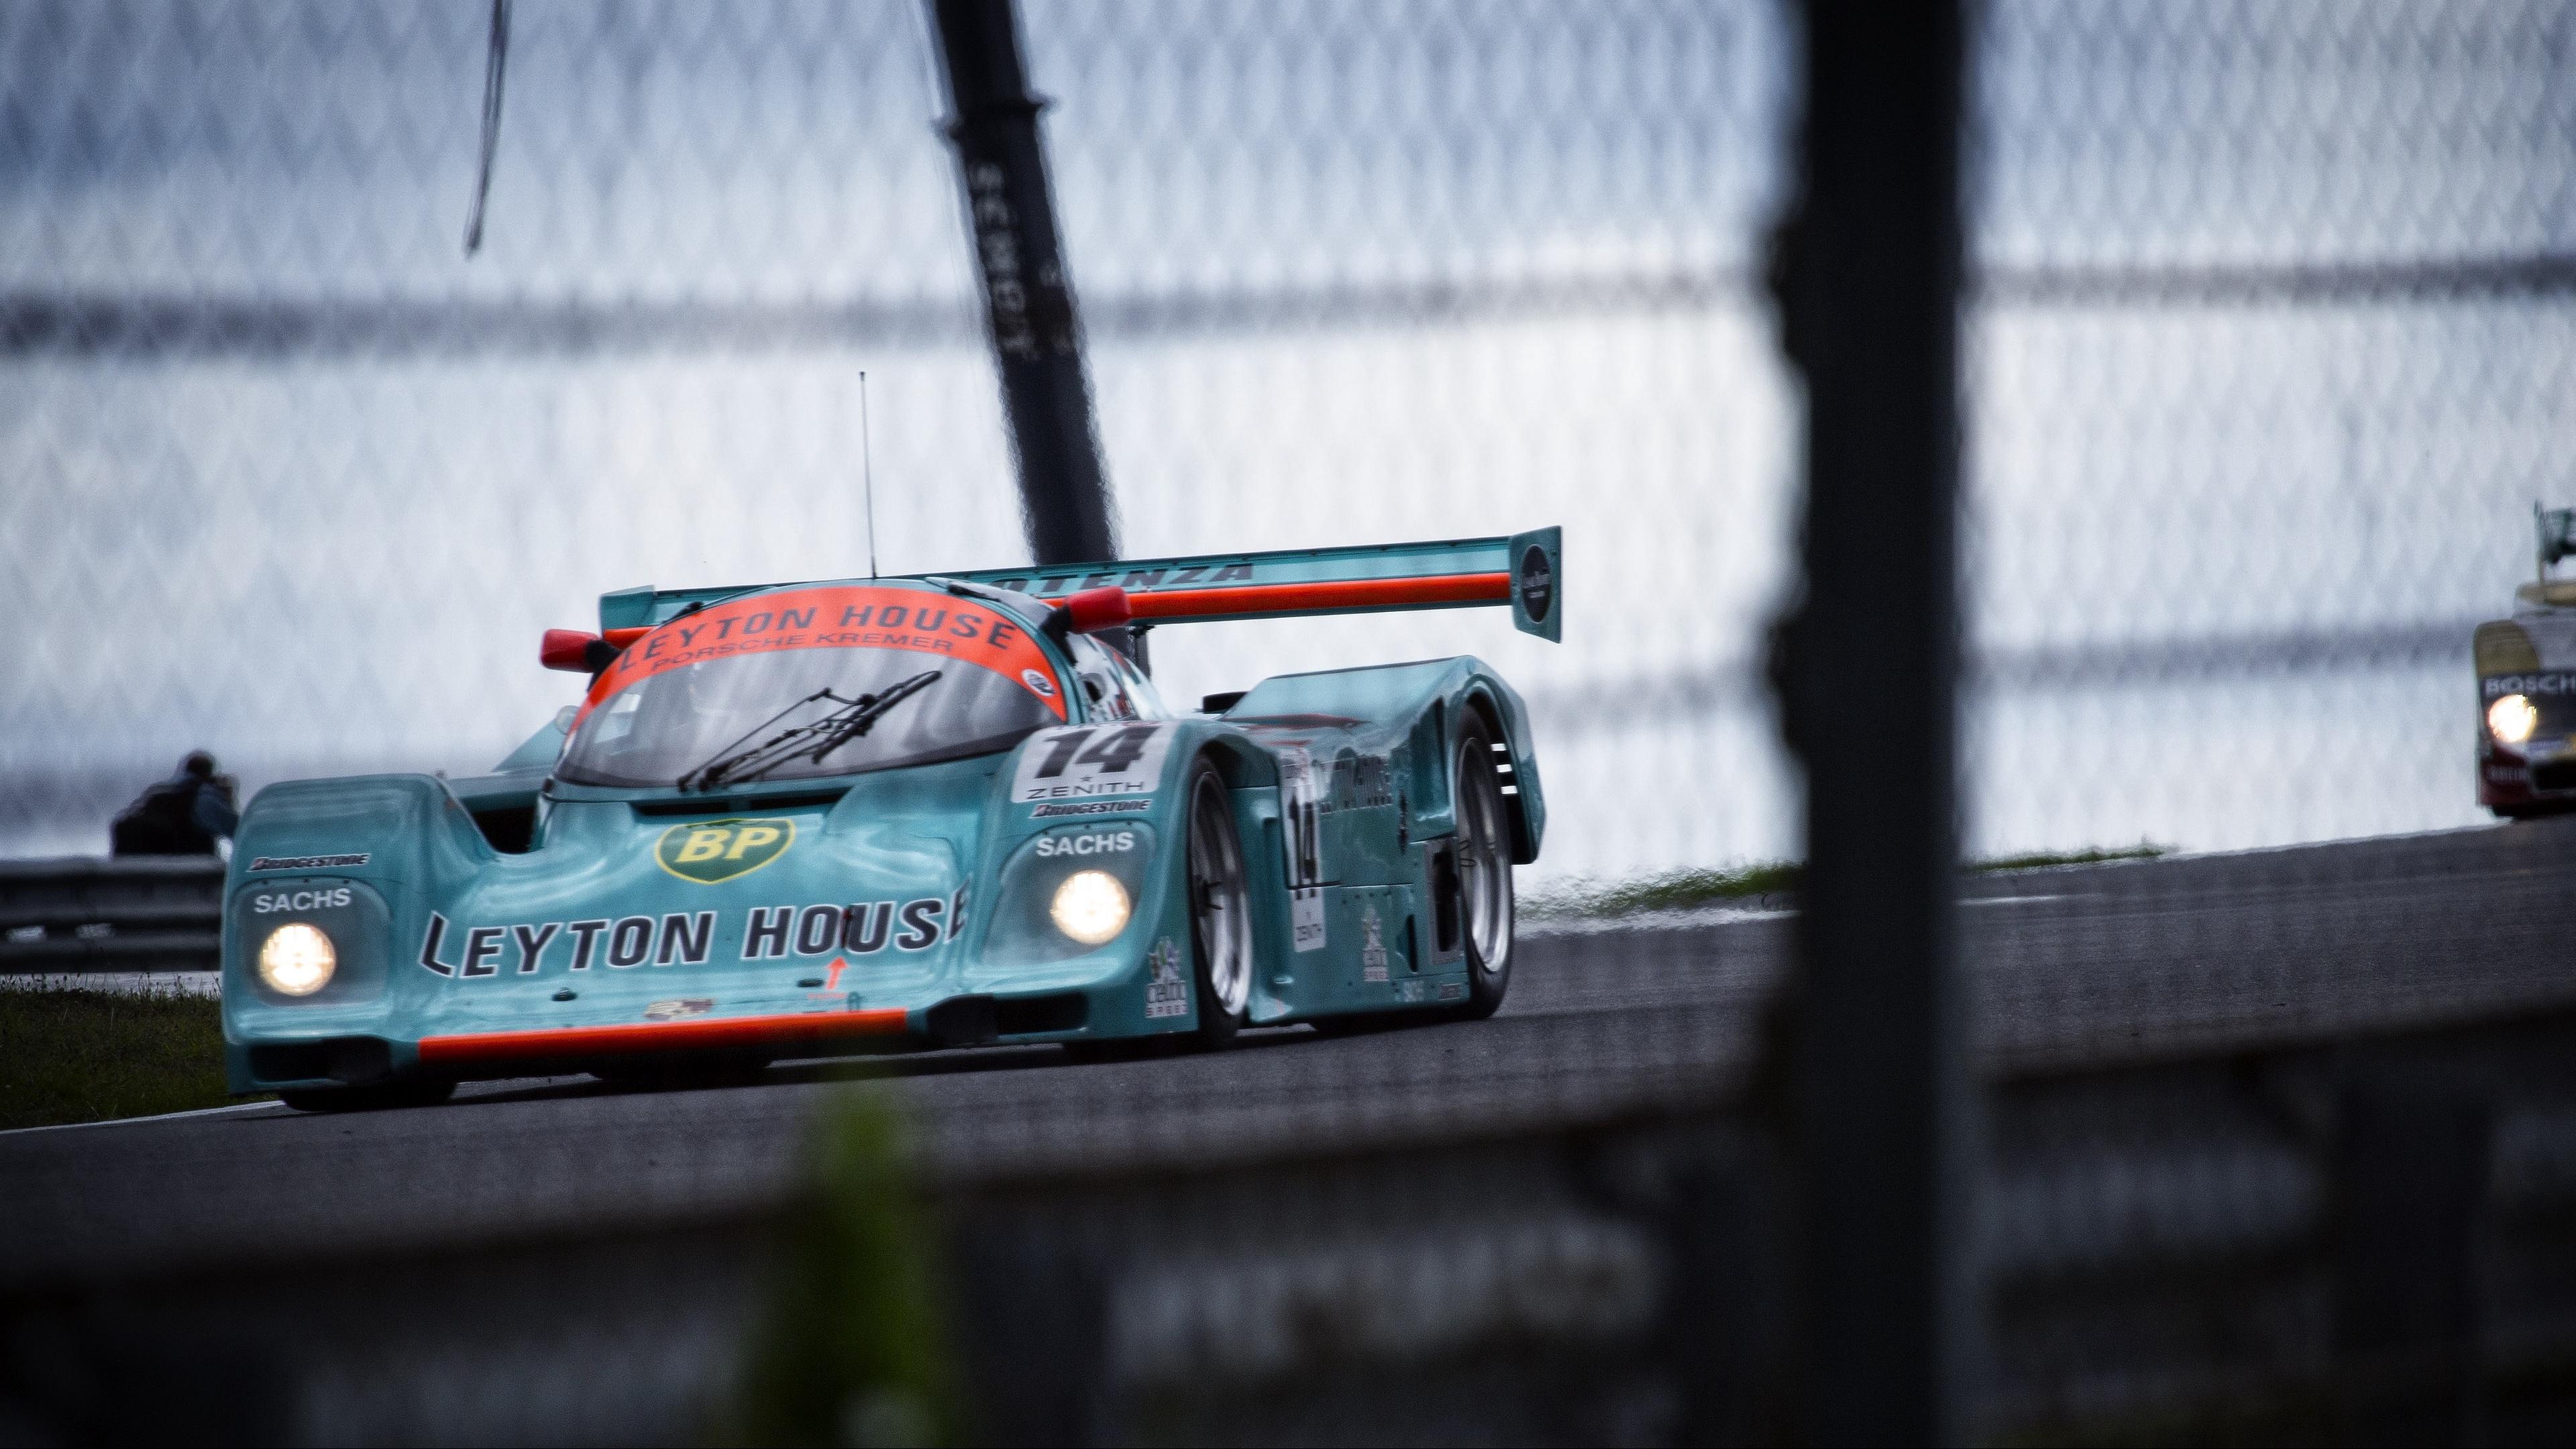 car racing race leyton house sports car 4k 1540062360 - car racing, race, leyton house, sports car 4k - Race, leyton house, car racing